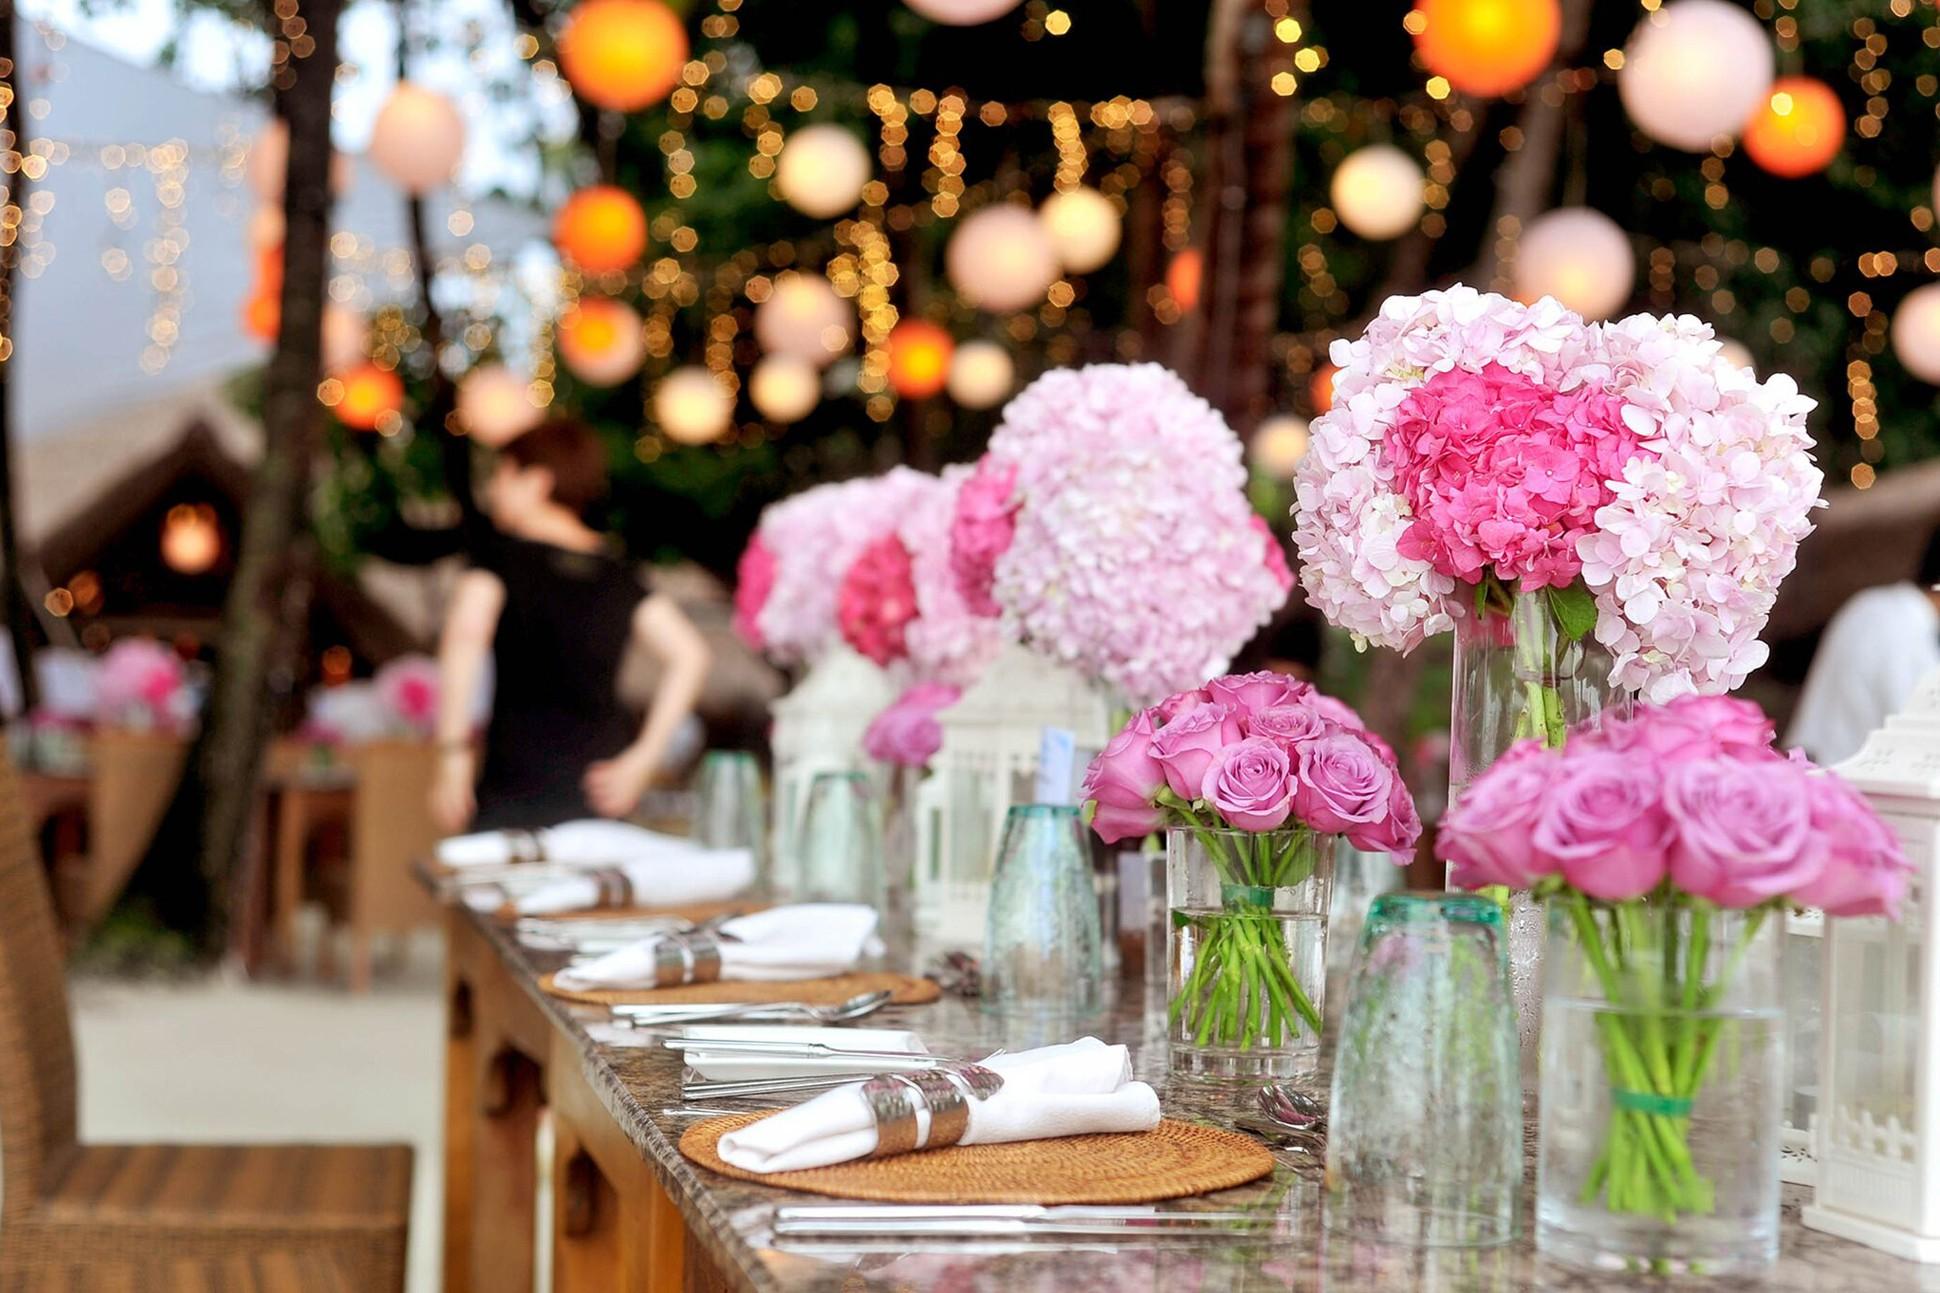 Photo of wedding table setting